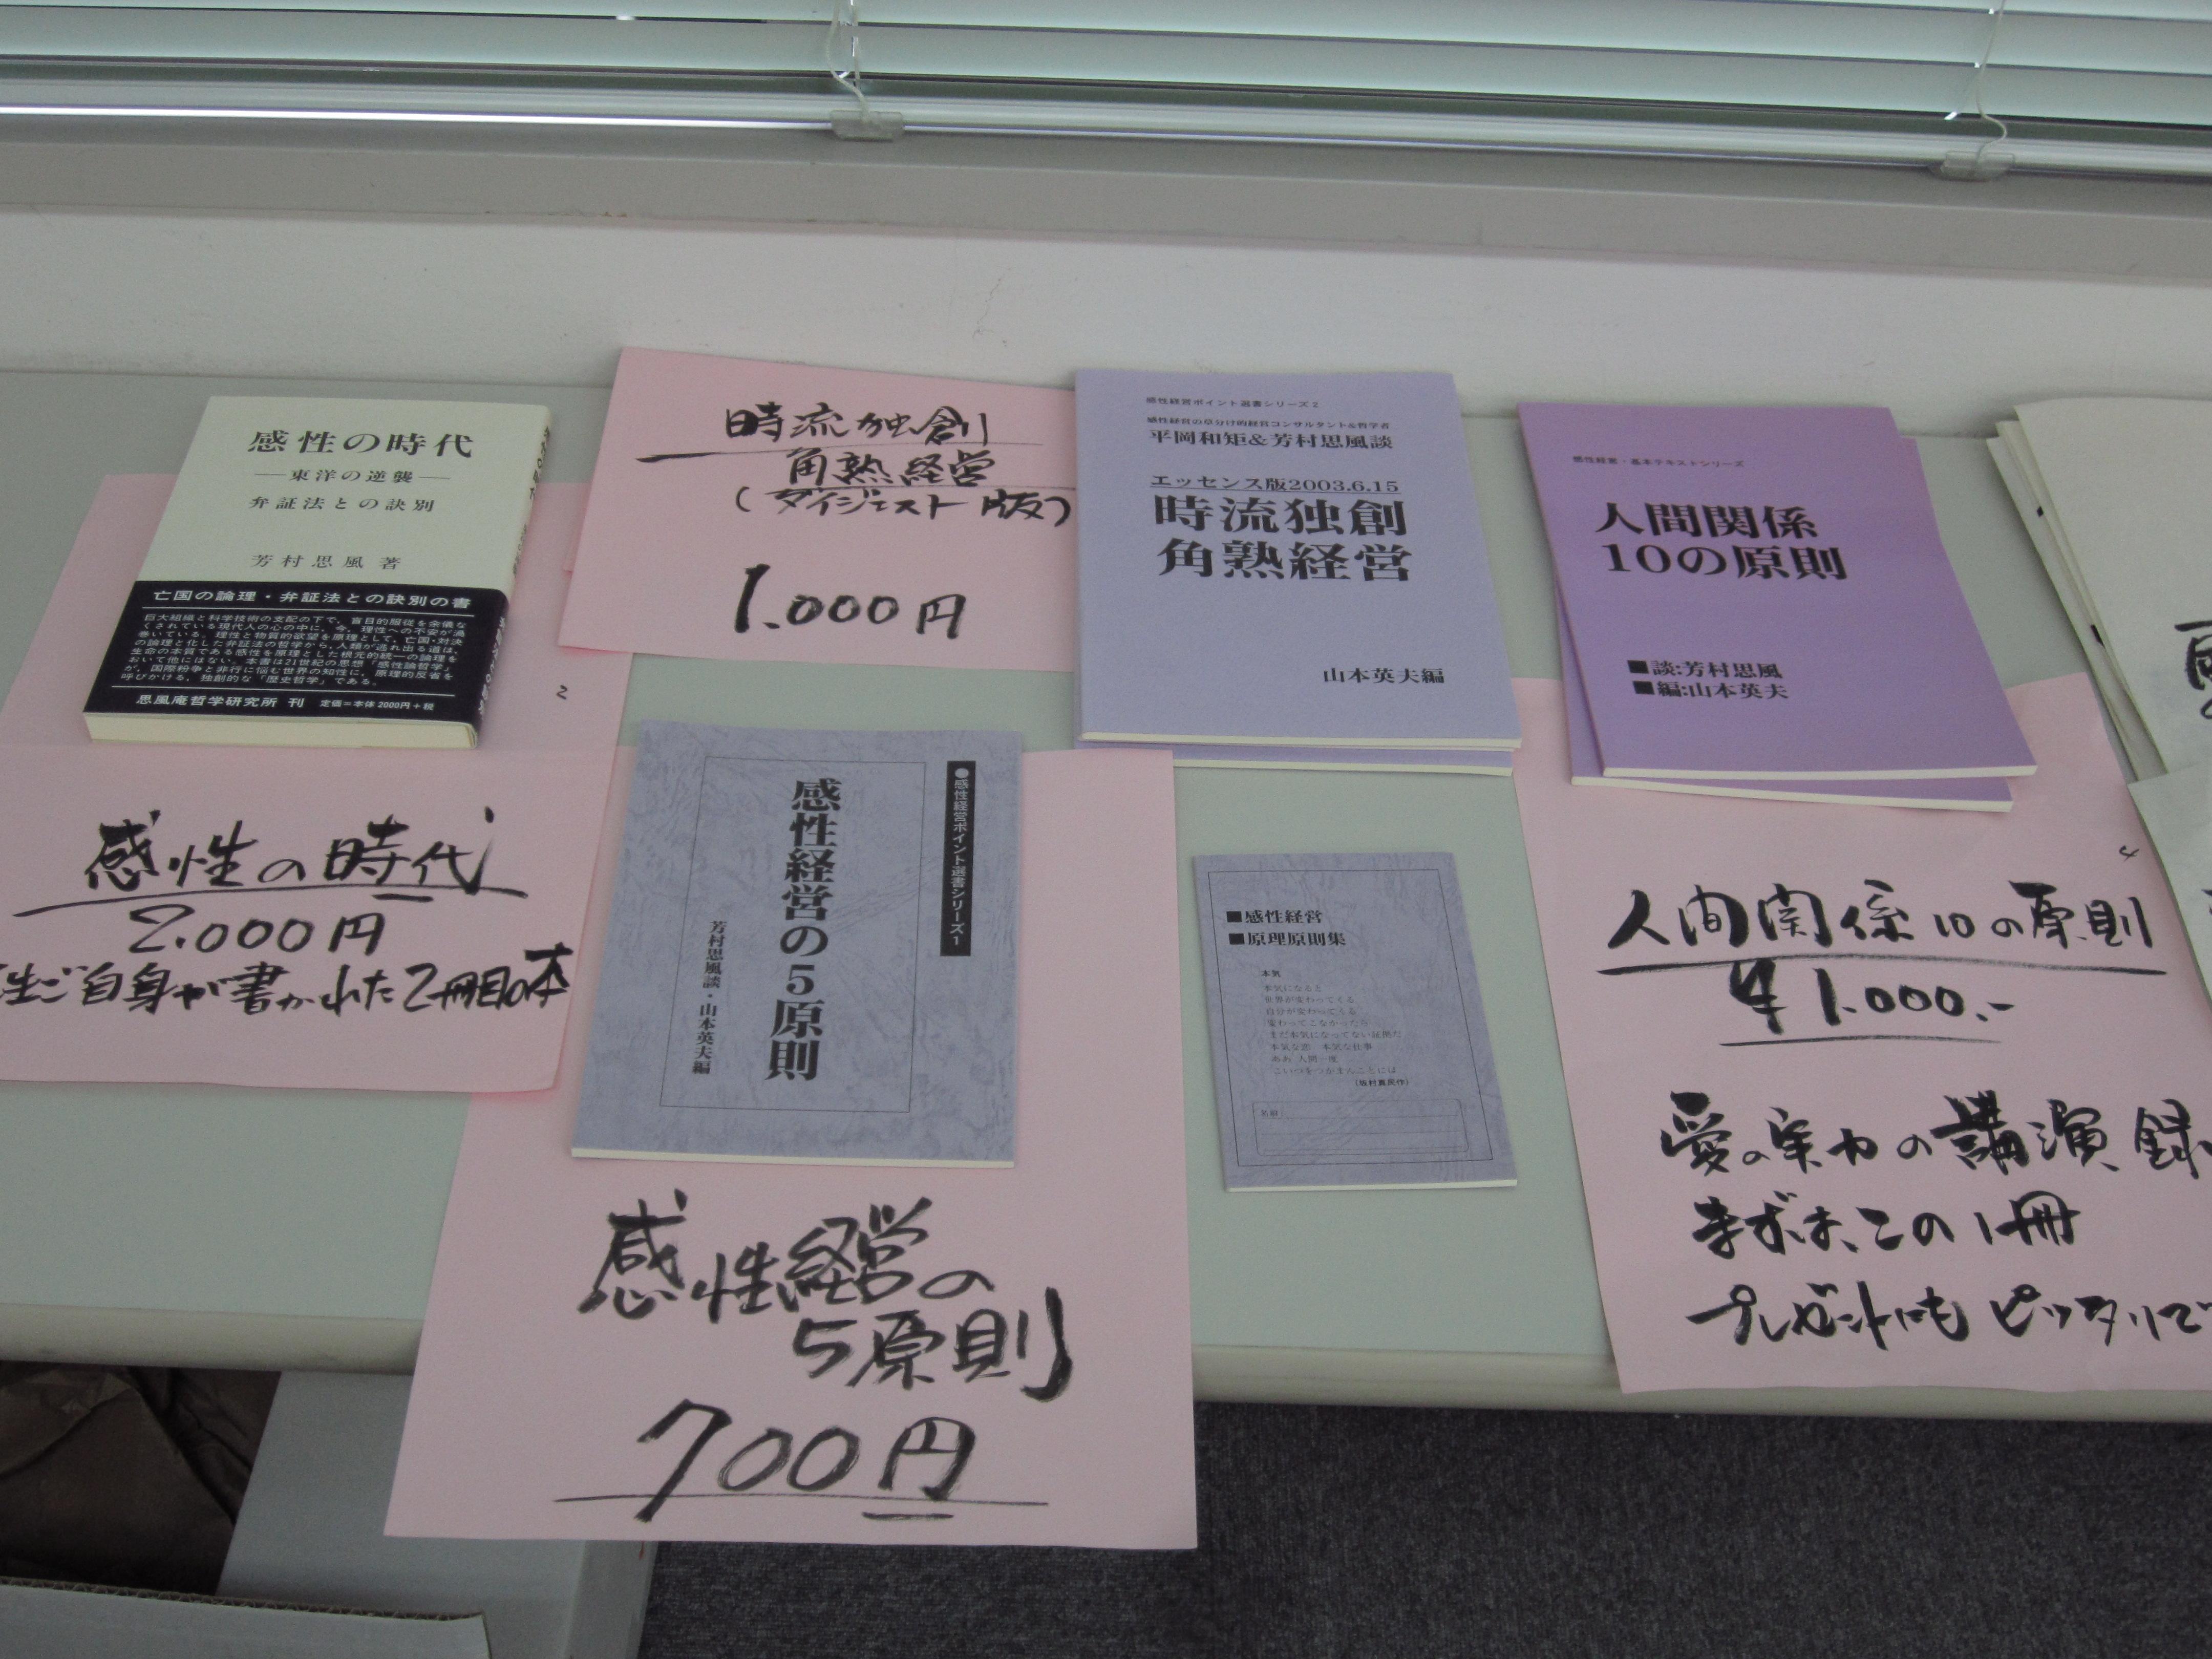 IMG 5609 - 4月1日東京思風塾の開催になります。